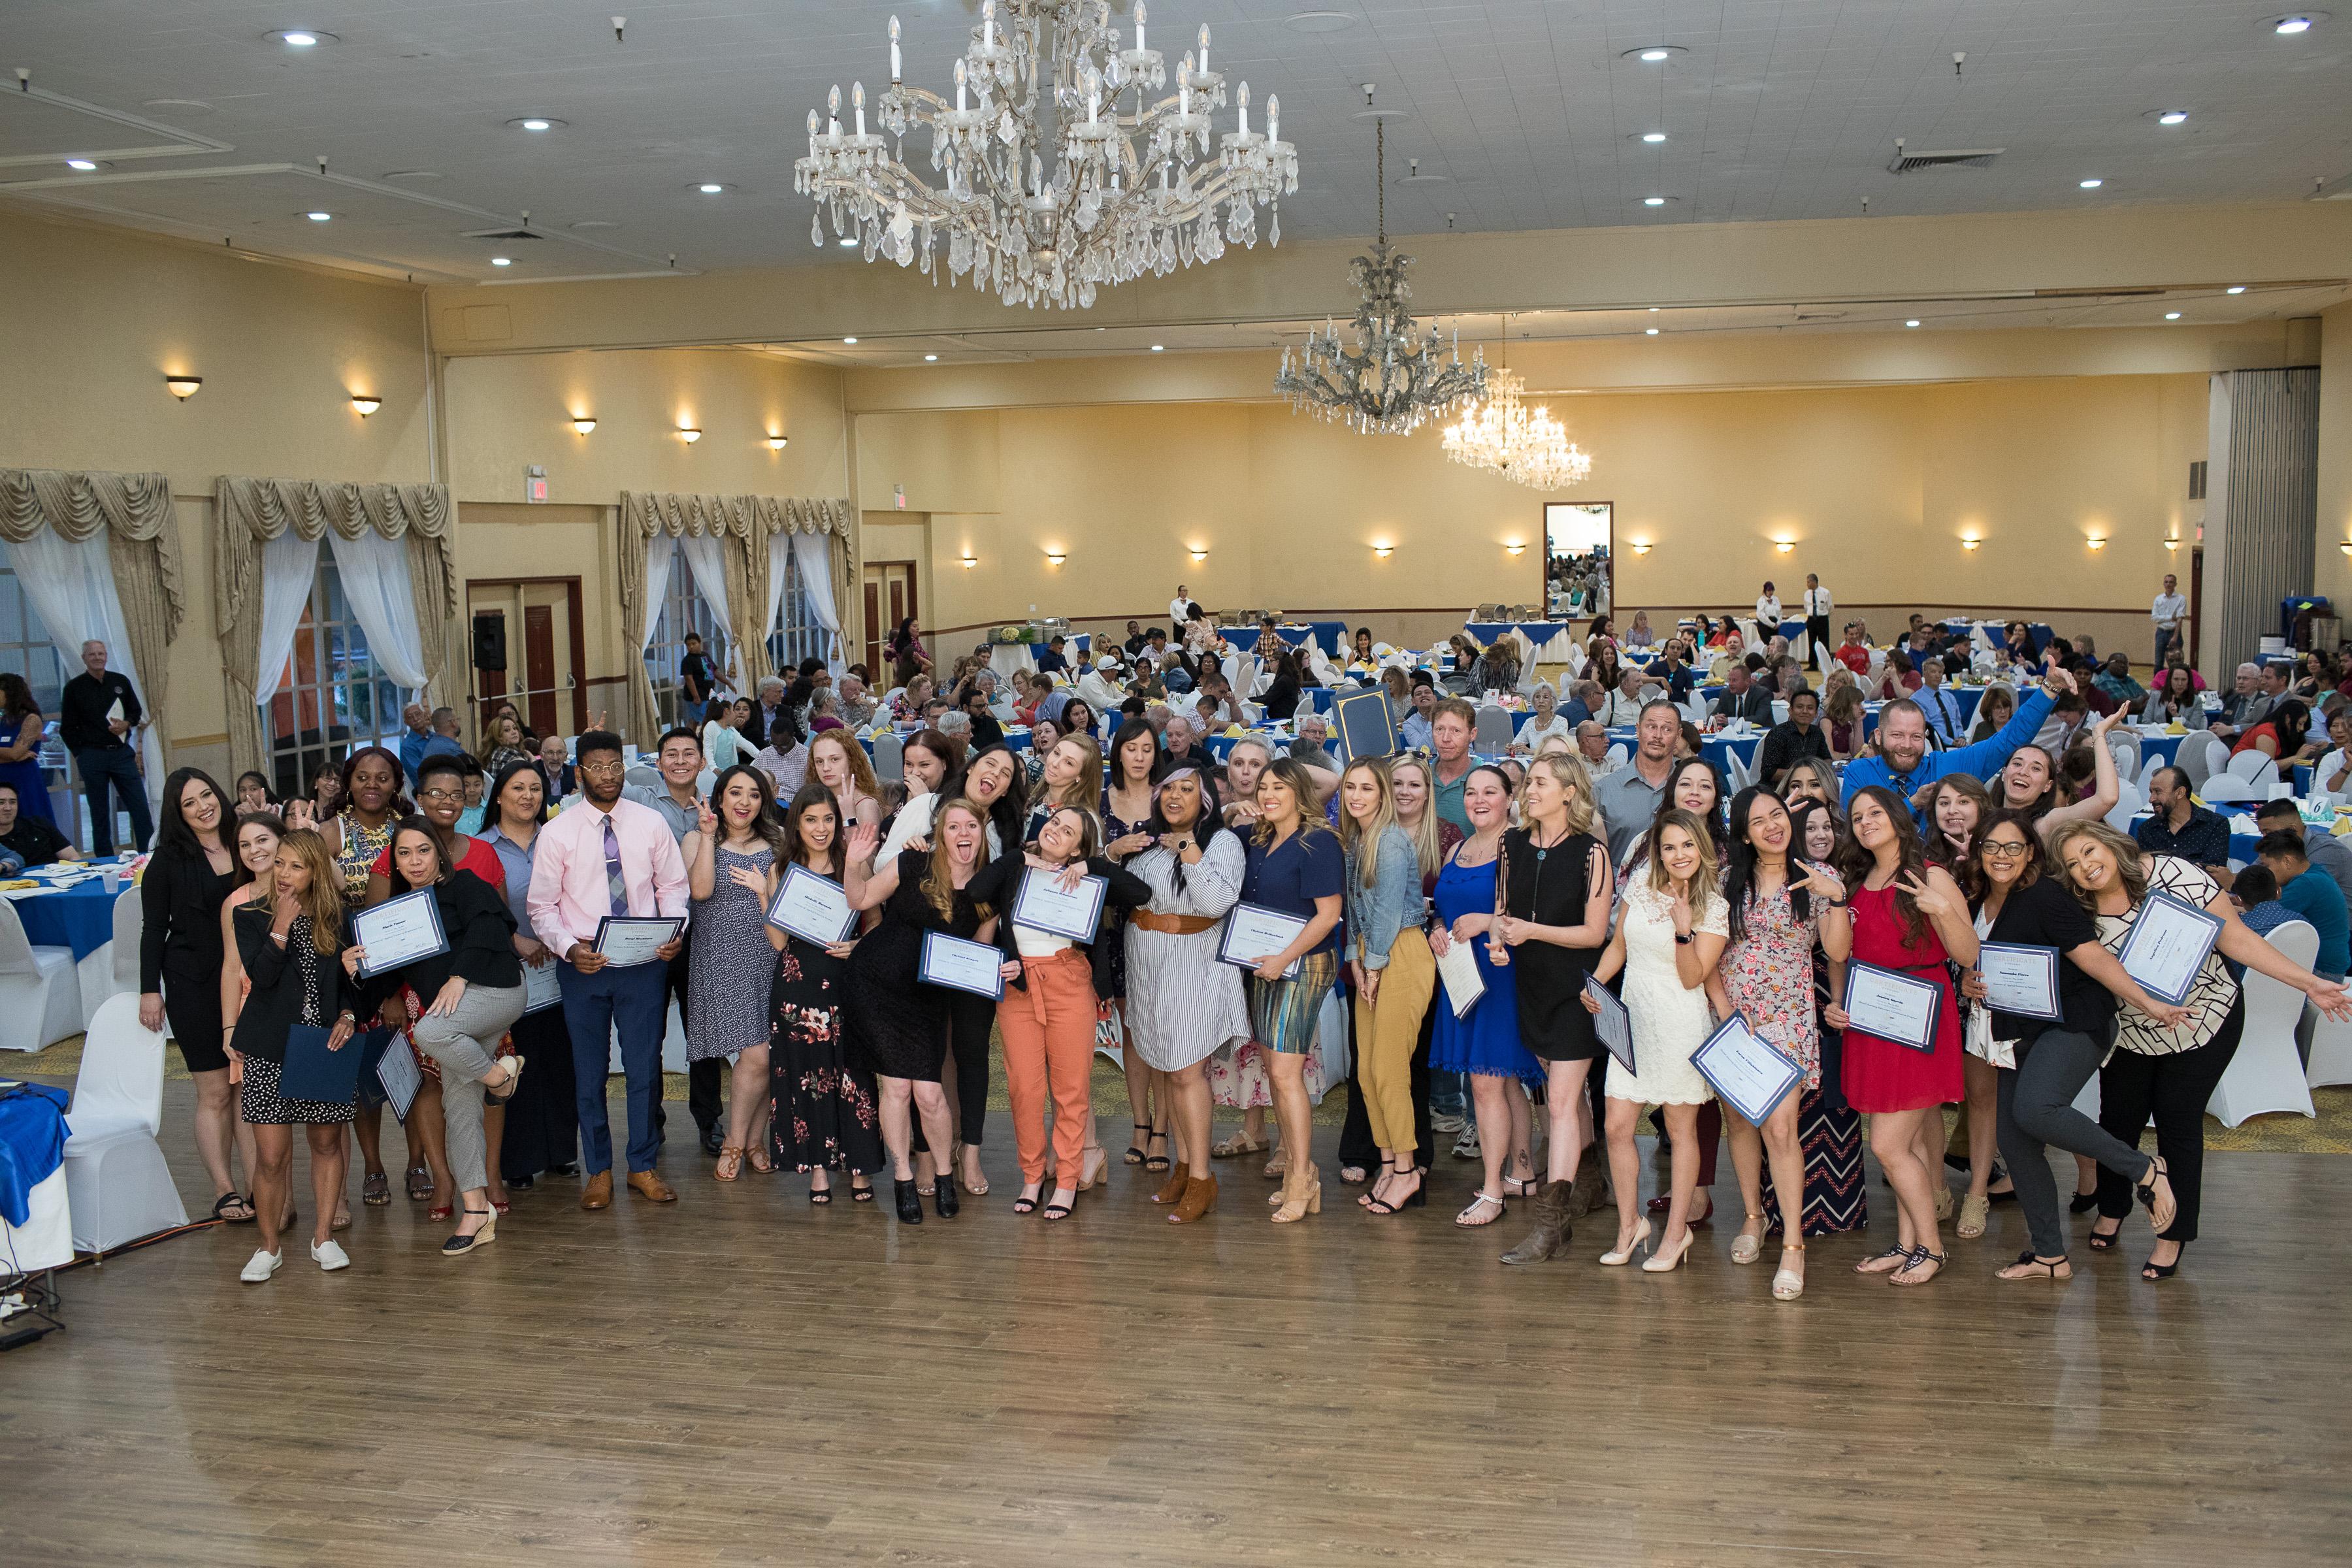 JobPath's 20th Annual Graduation